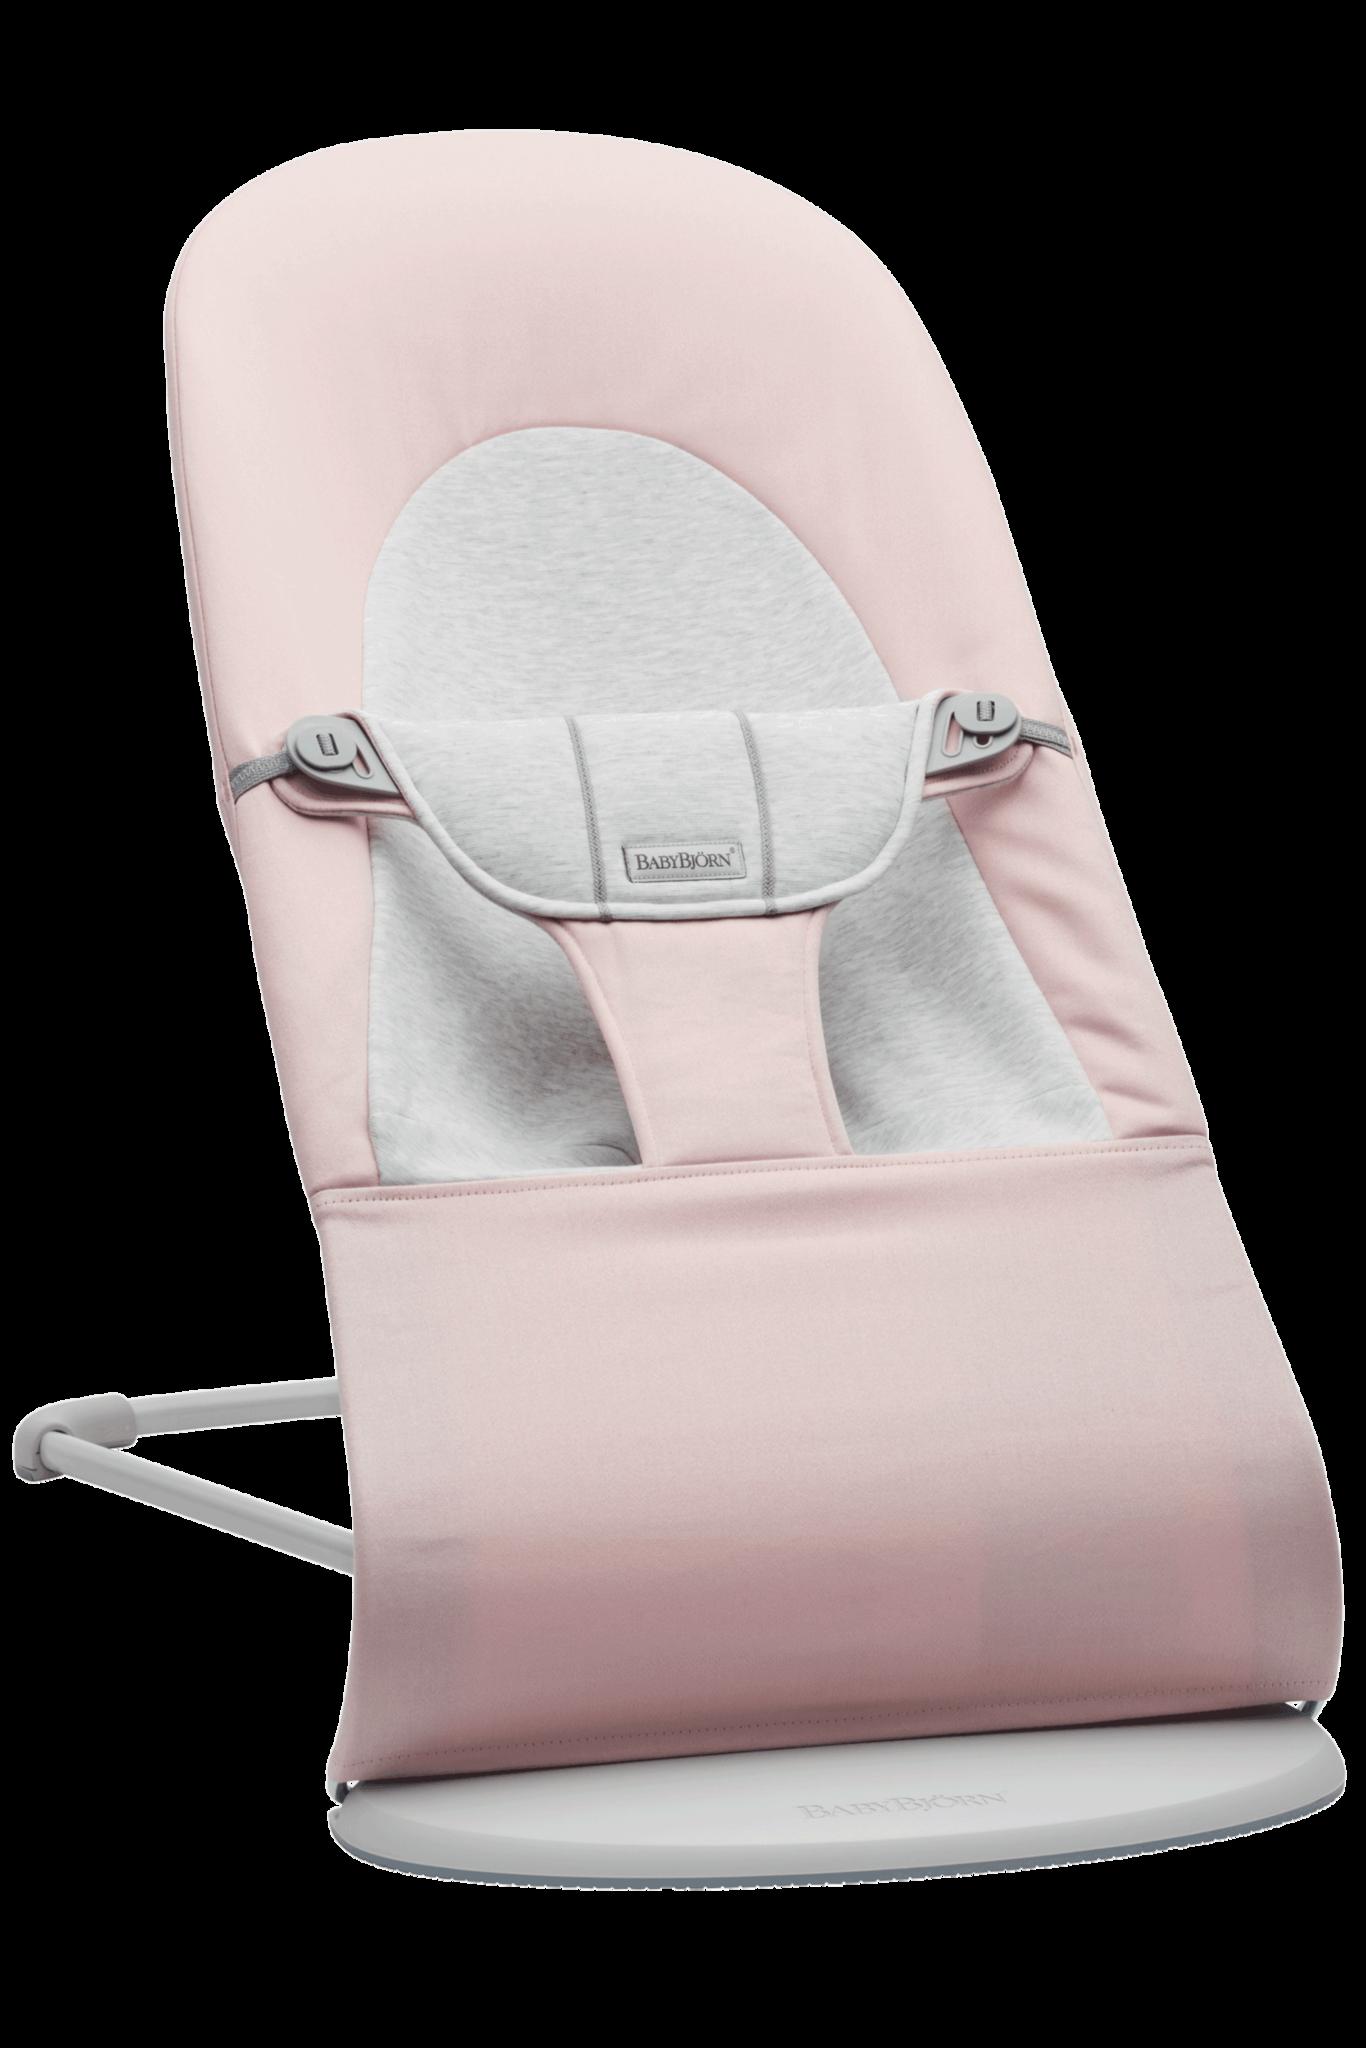 BABYBJÖRN Wipstoeltje Balance Soft Lichtgrijs frame Lichtroze-Grijs Cotton Jersey